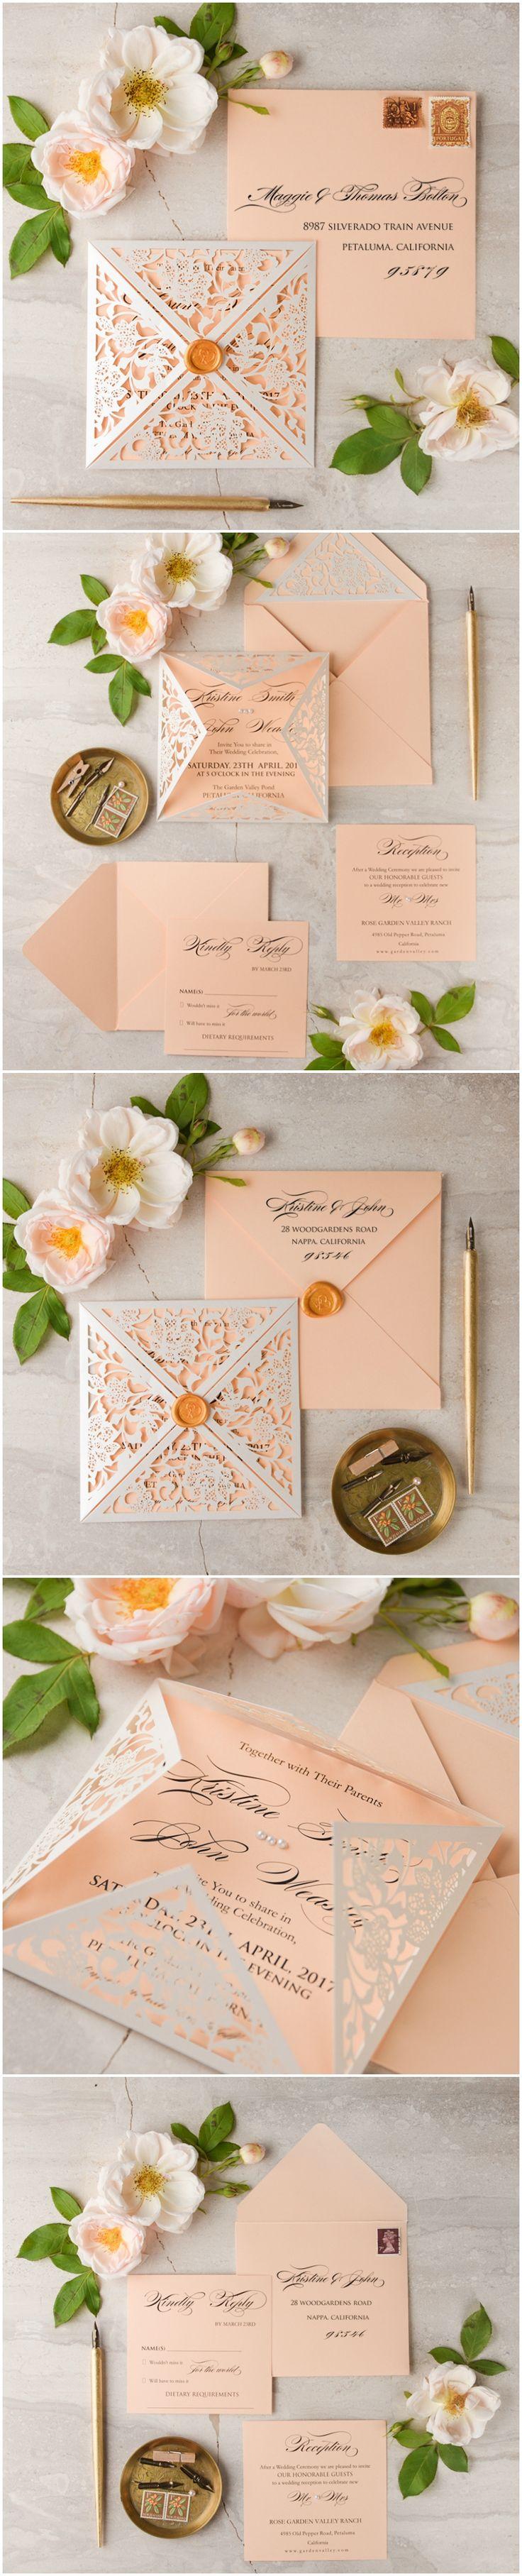 Peach Laser cut Wedding Invitation calligraphy